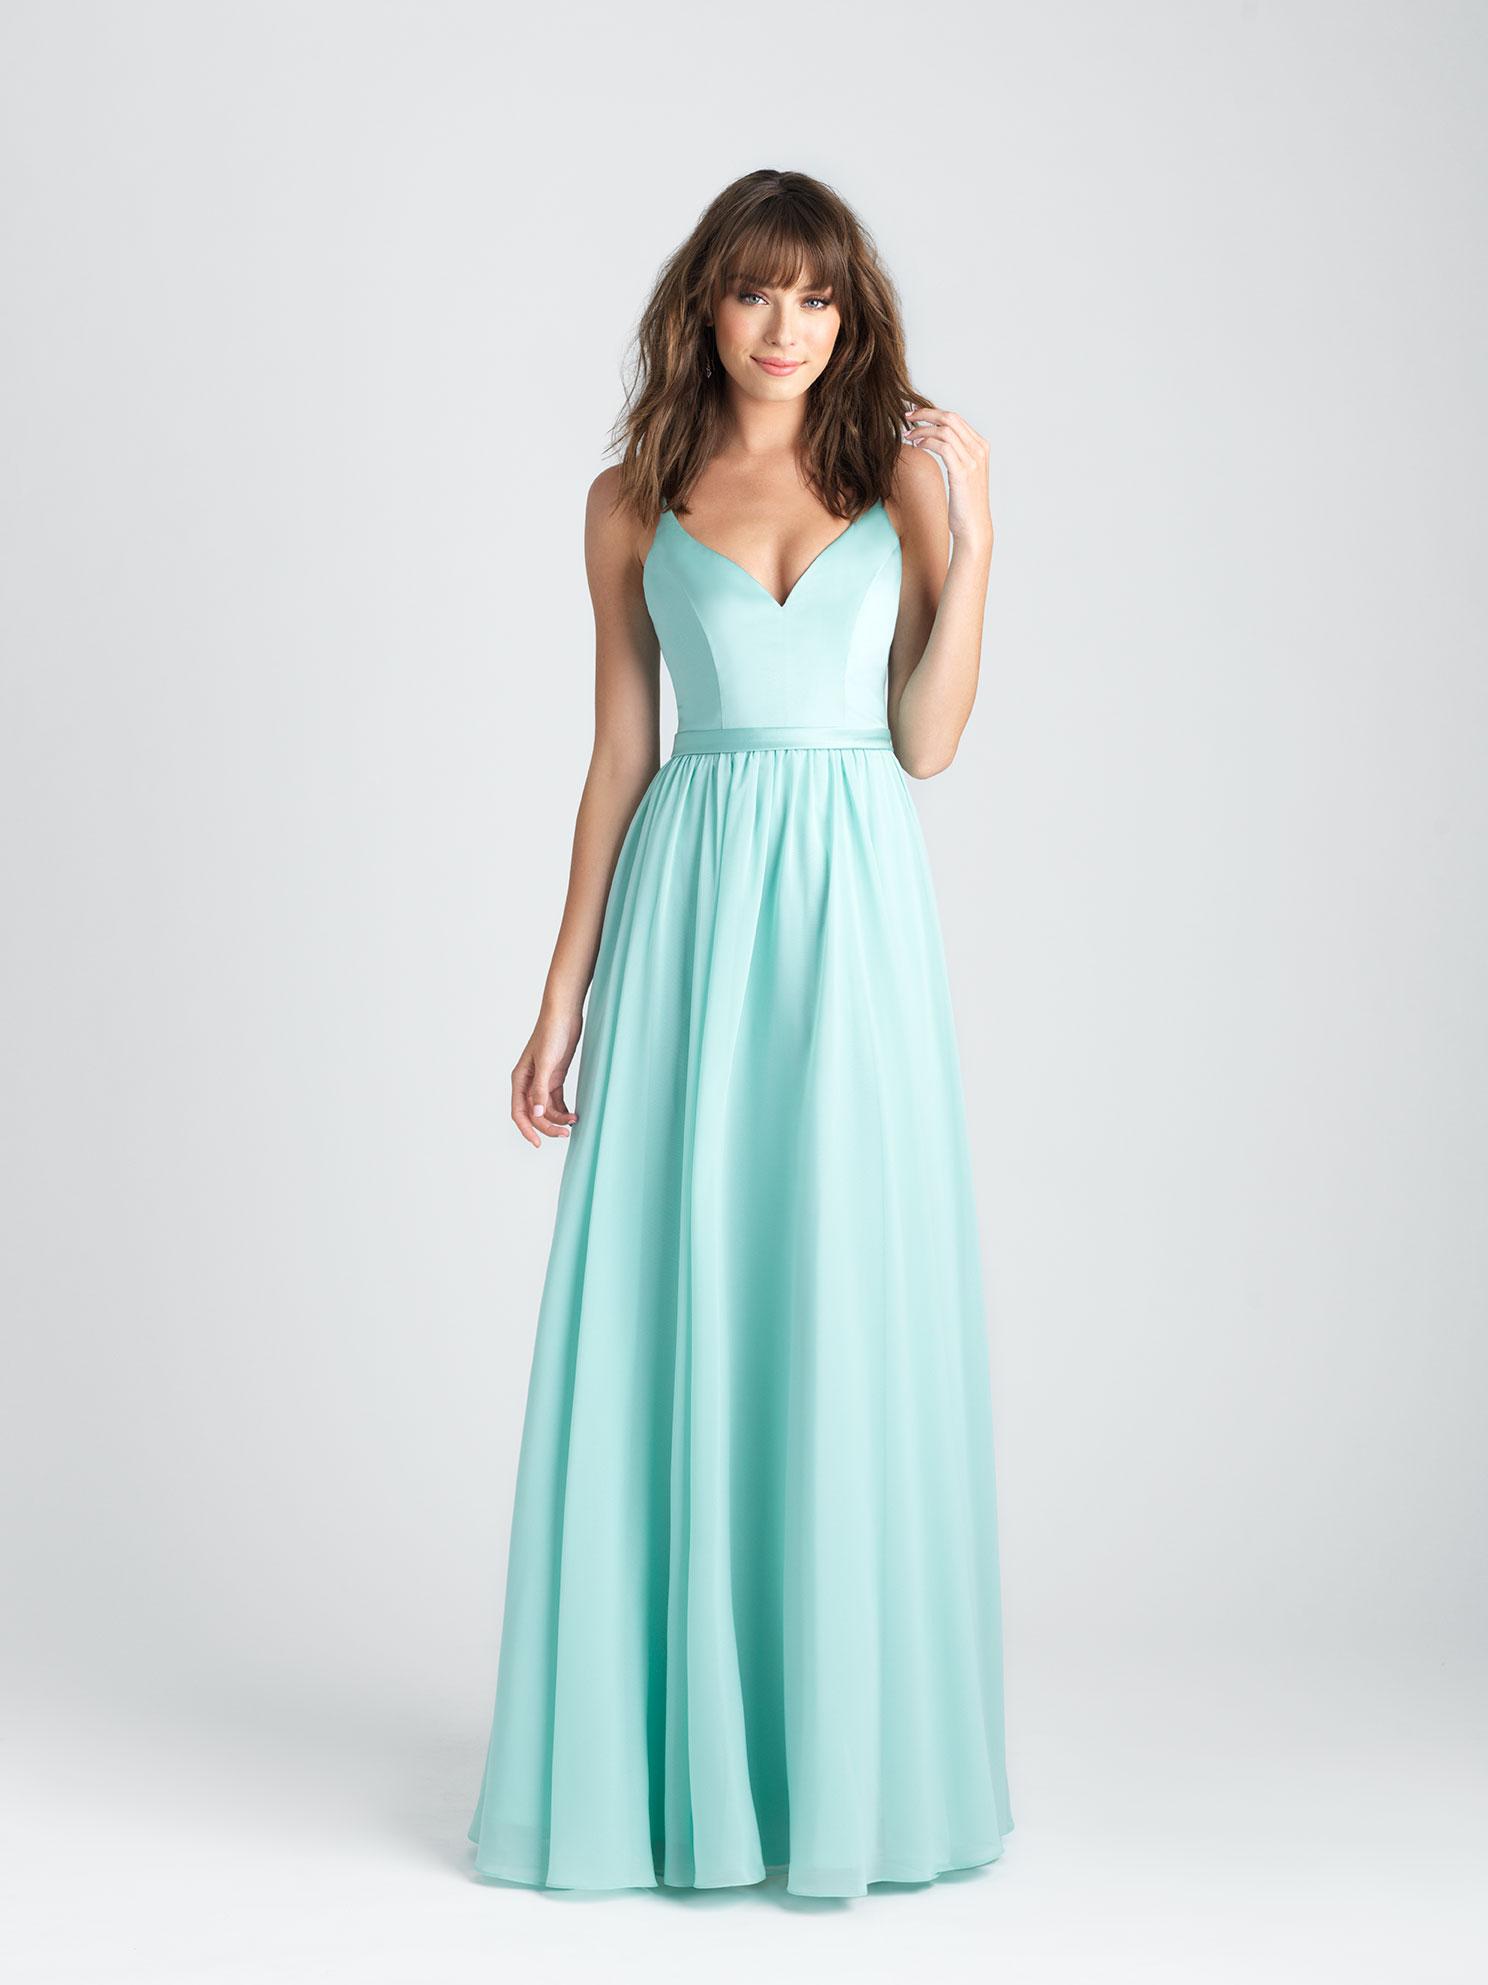 perfect wedding dresses photo - 1